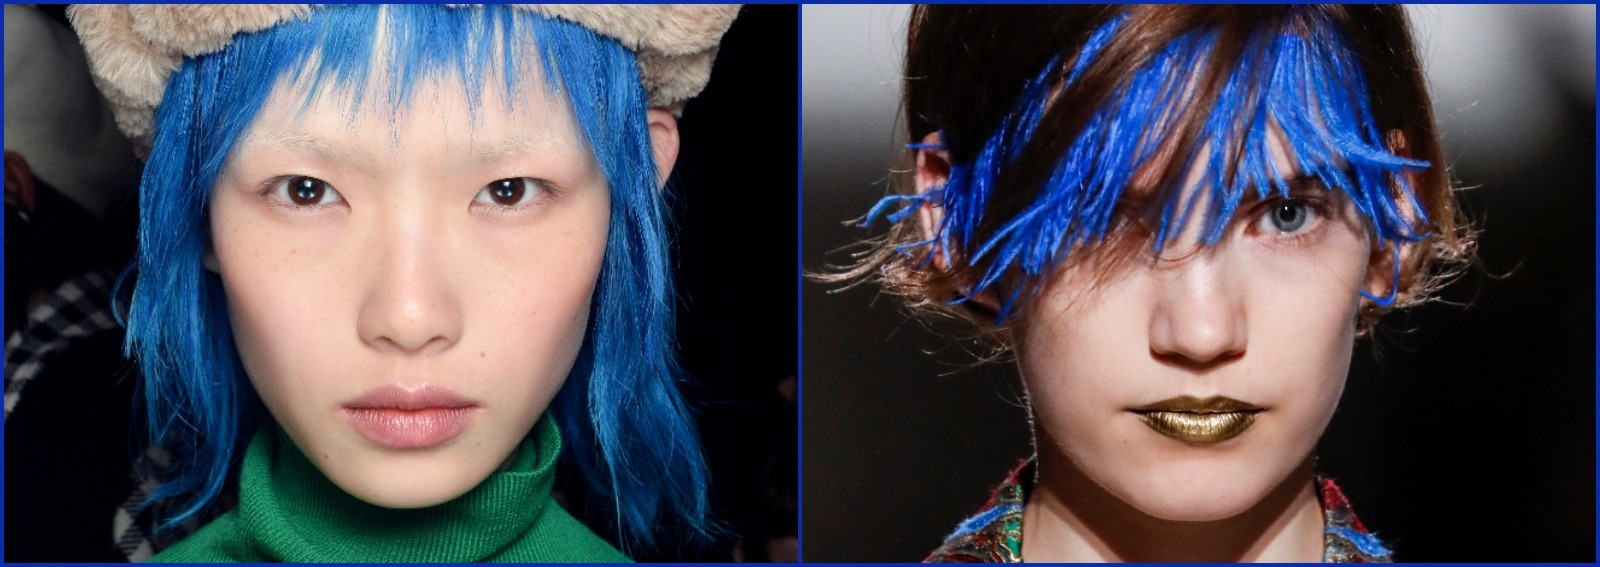 classic-blue-hair-capelli-blu-pantone-2020-tendenze-colore-tinta-cover destkop